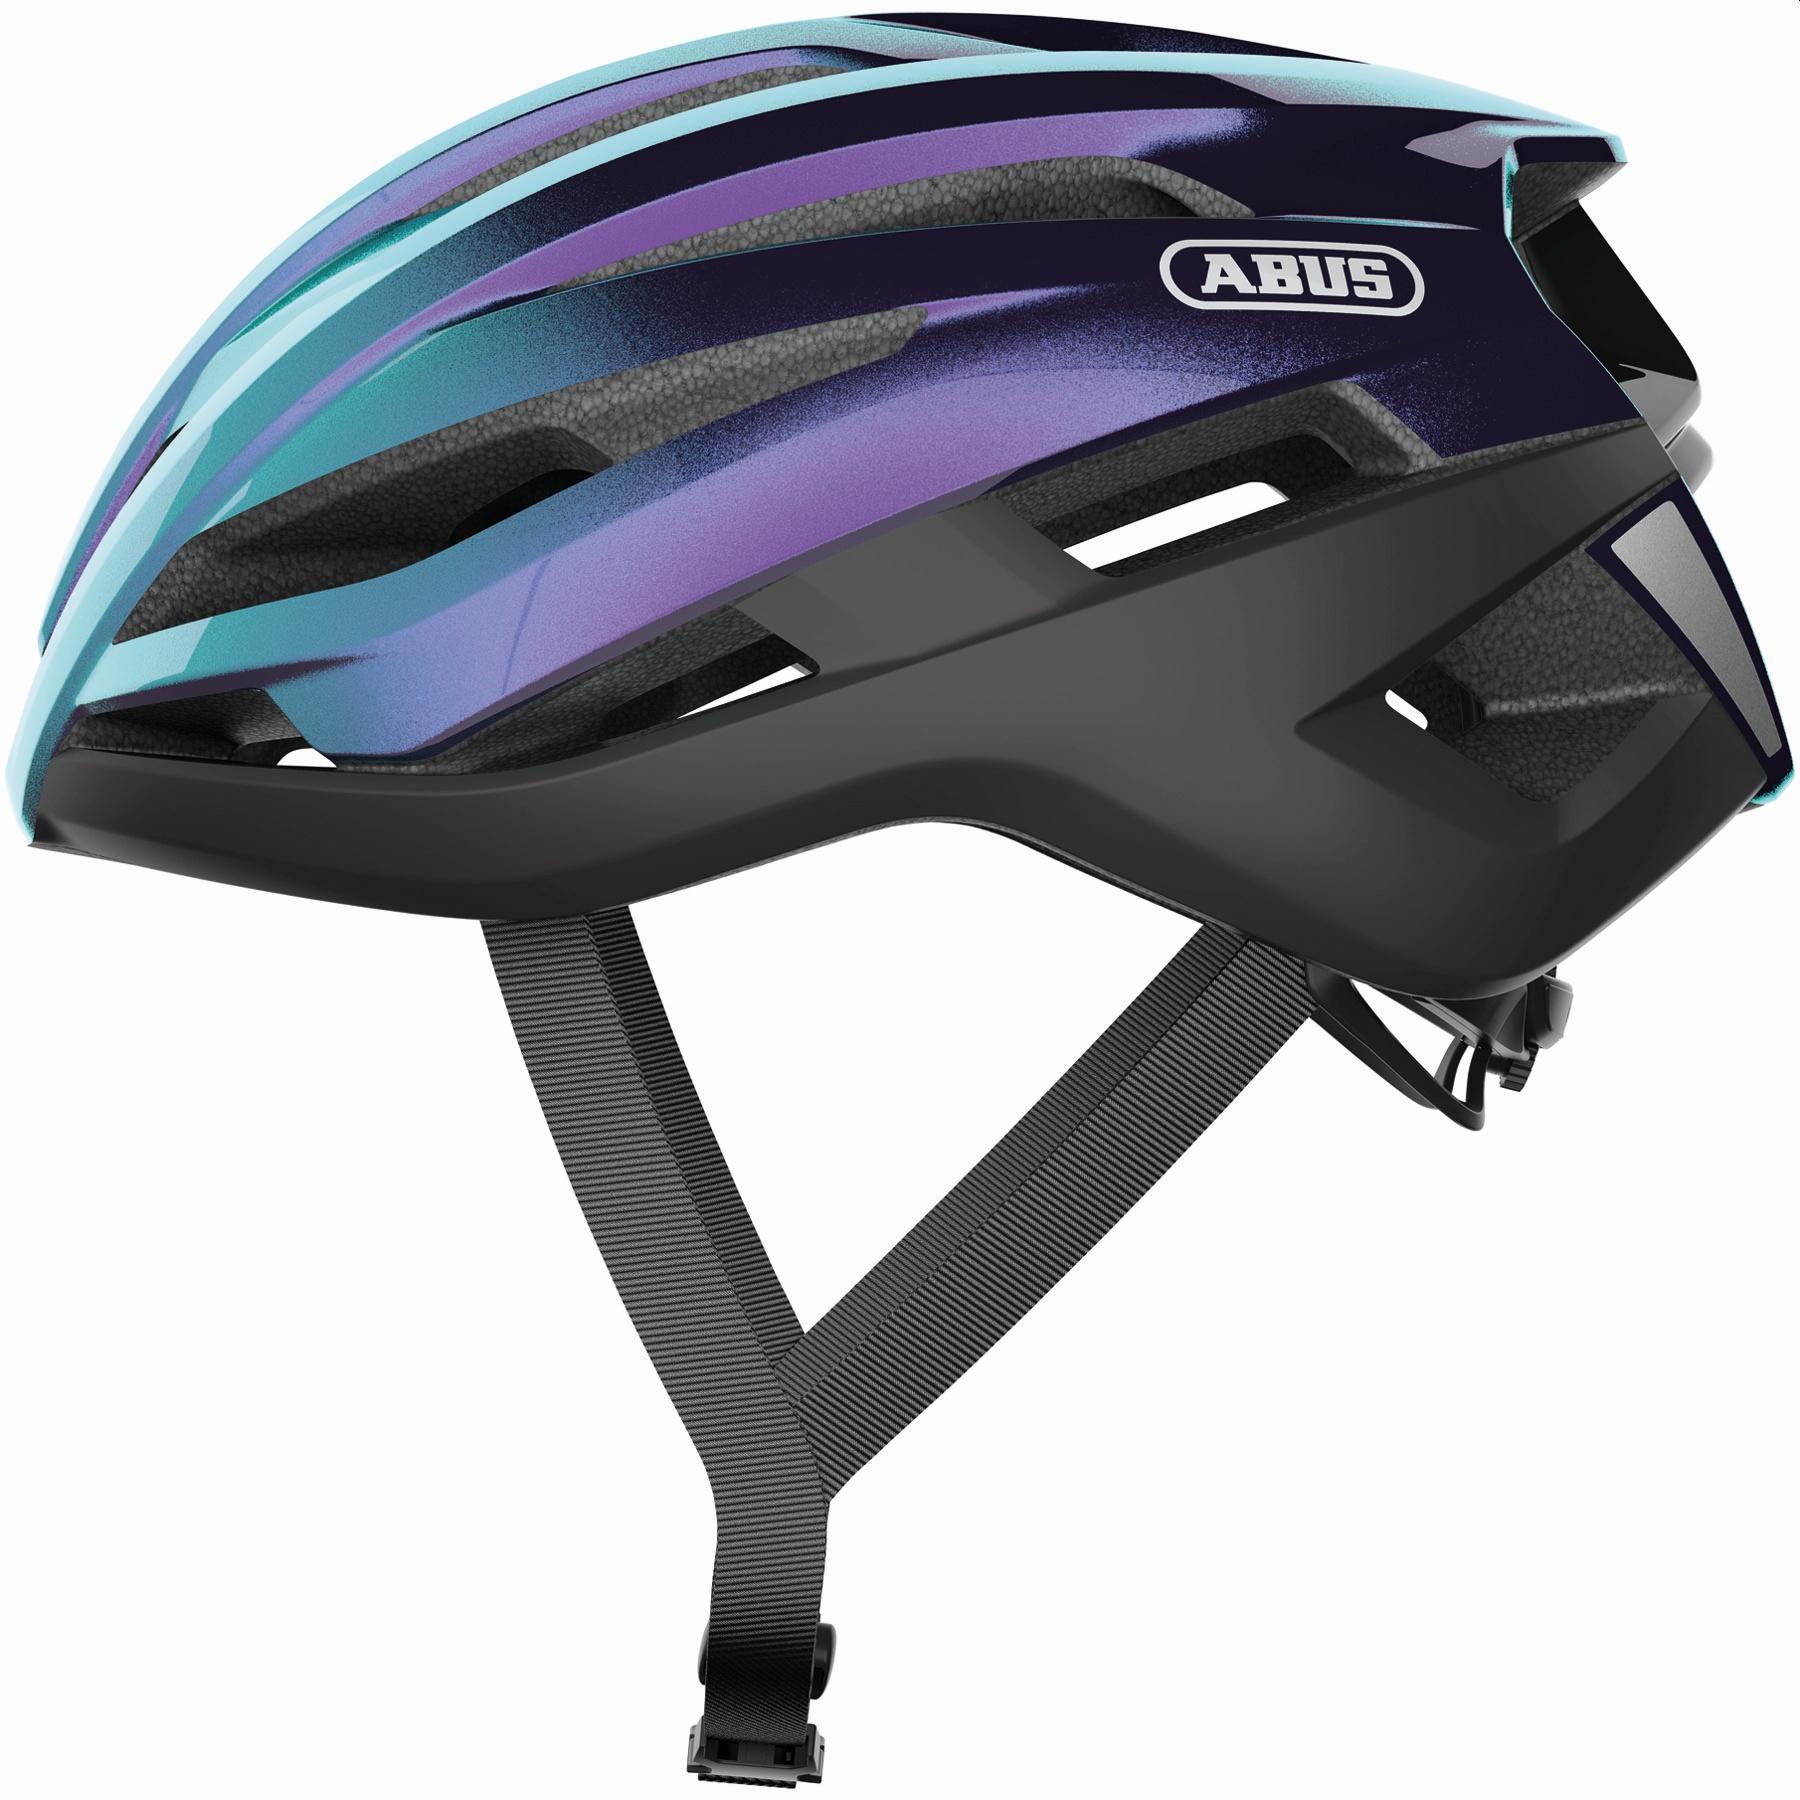 ABUS StormChaser Casco de Carretera - flipflop purple